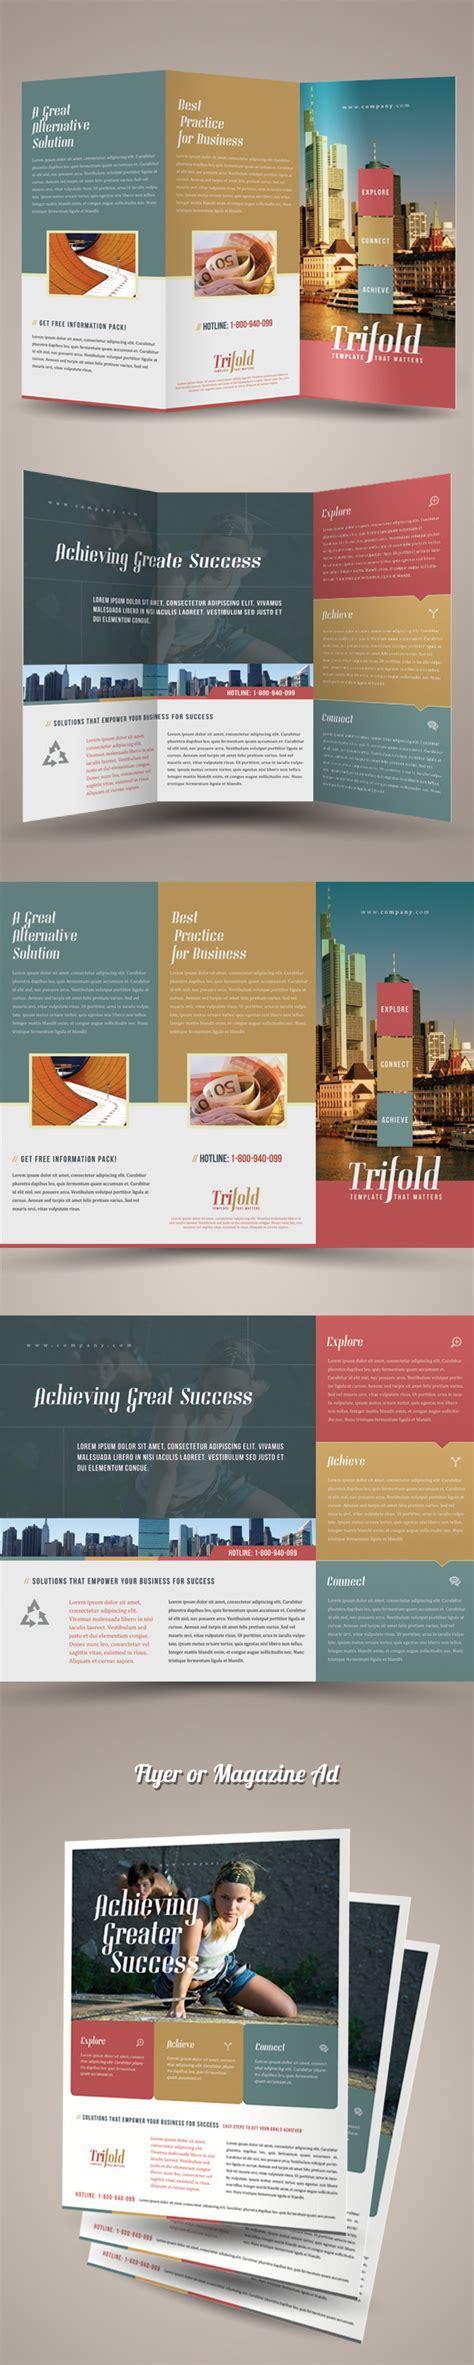 Flyer Design On Behance | trifold brochure template on behance